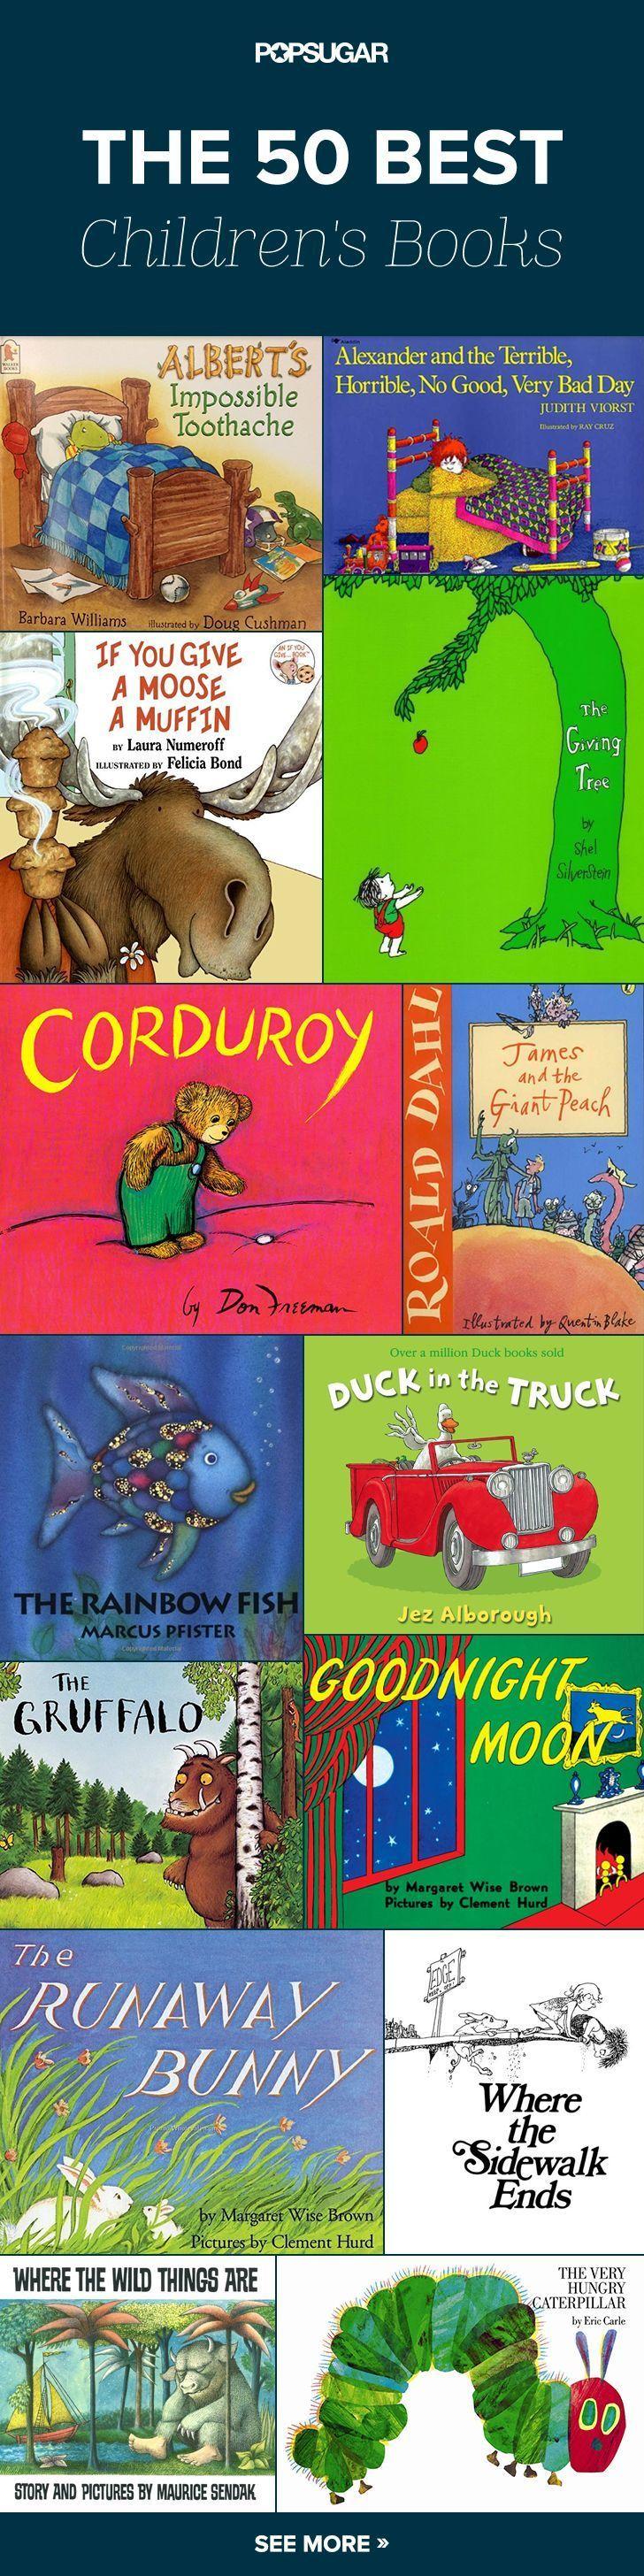 Top 50 best Children's books.         #book #list #booklist #best #children #school #students #home #family #kids